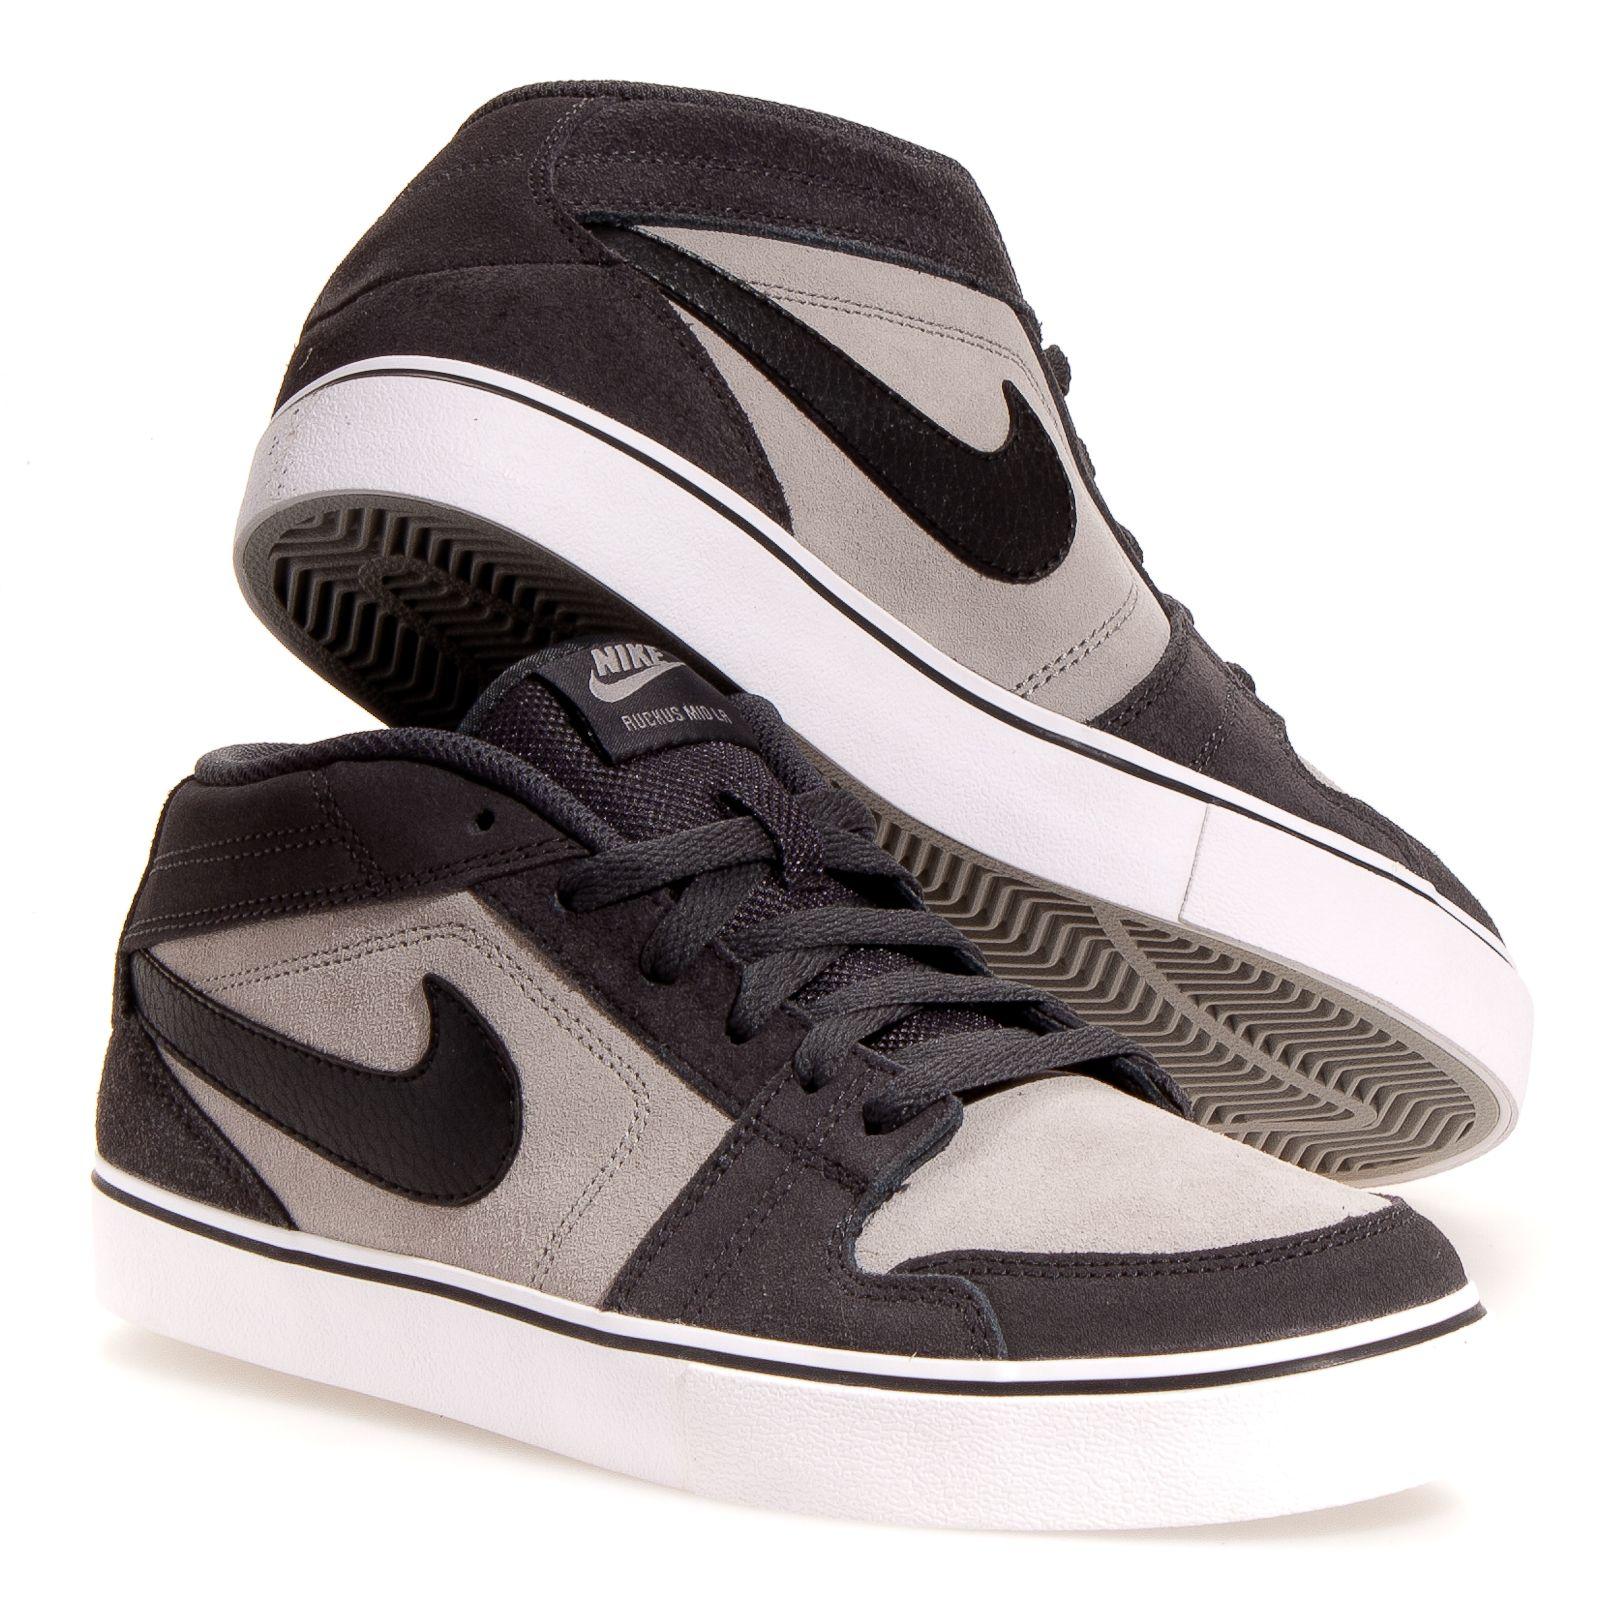 Nike Satire Mens Skate Shoes Black 13  Shoes  Pinterest  Skate shoes Sport wear and Dress shoes